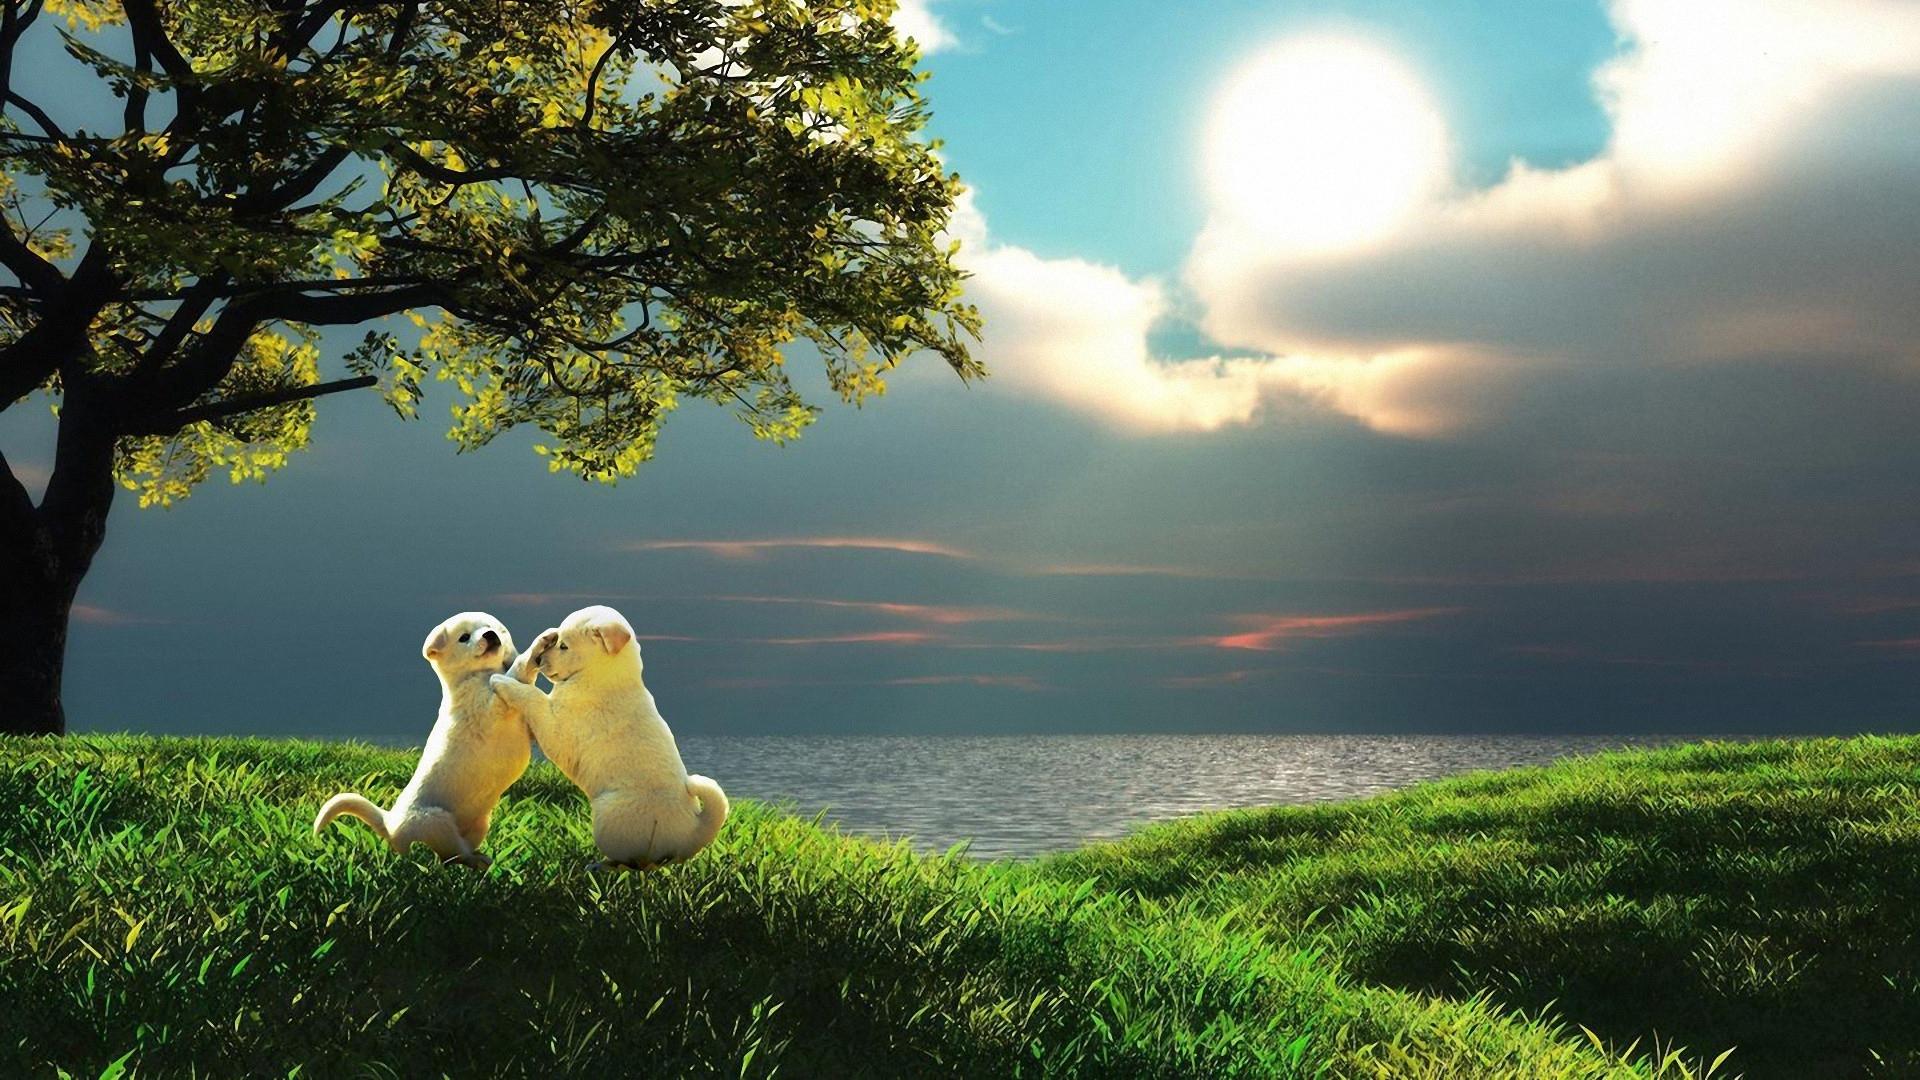 Sfondi hd cagnolini nei prati bellissimi sfondi hd gratis for Sfondi paesaggi bellissimi